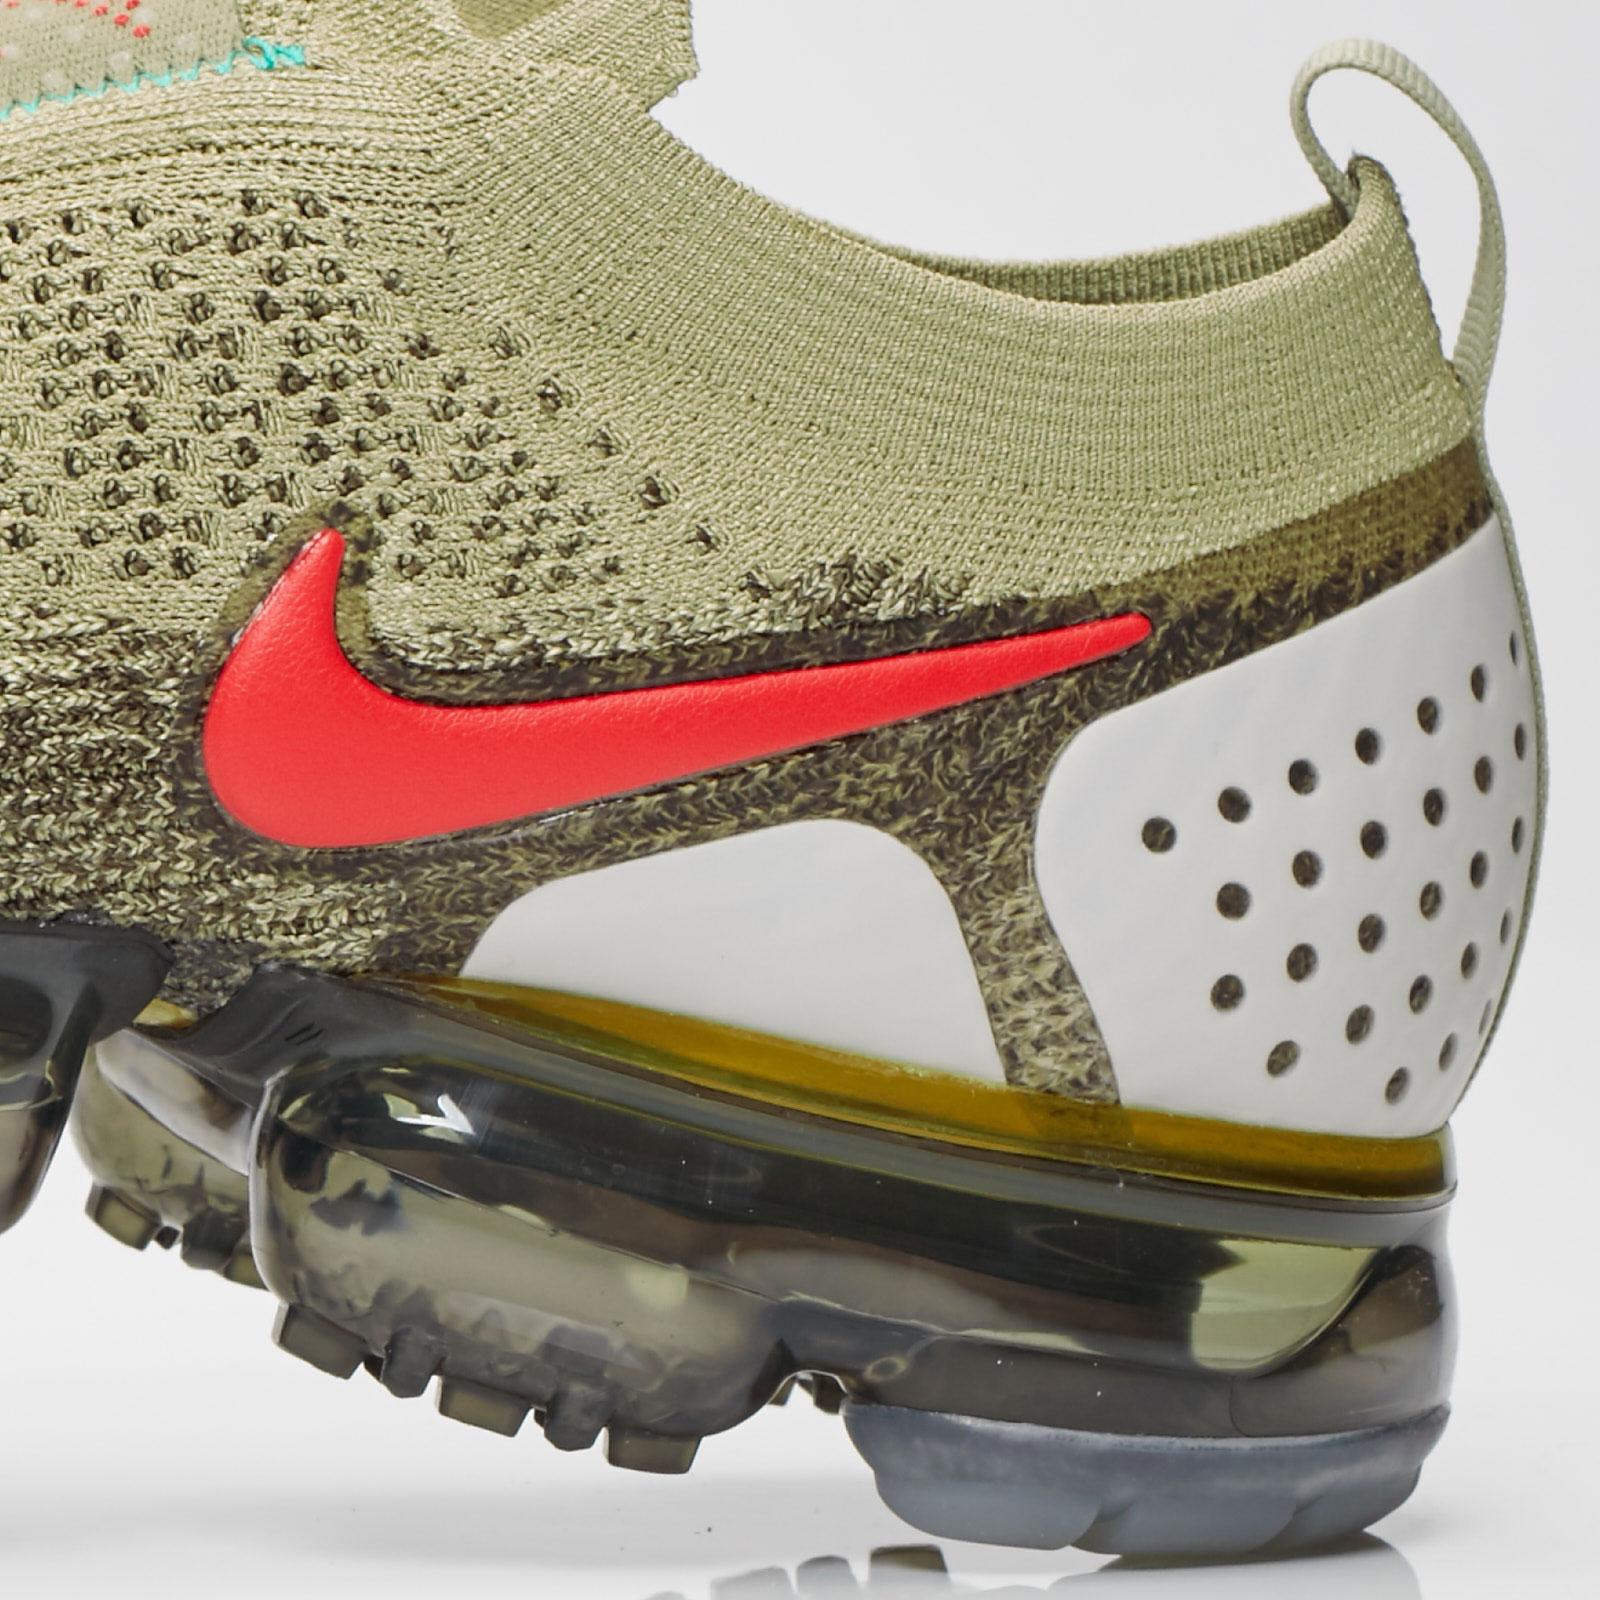 Nike Air Vapormax FK Moc 2 - Ah7006-200 - Sneakersnstuff  aaccdd815